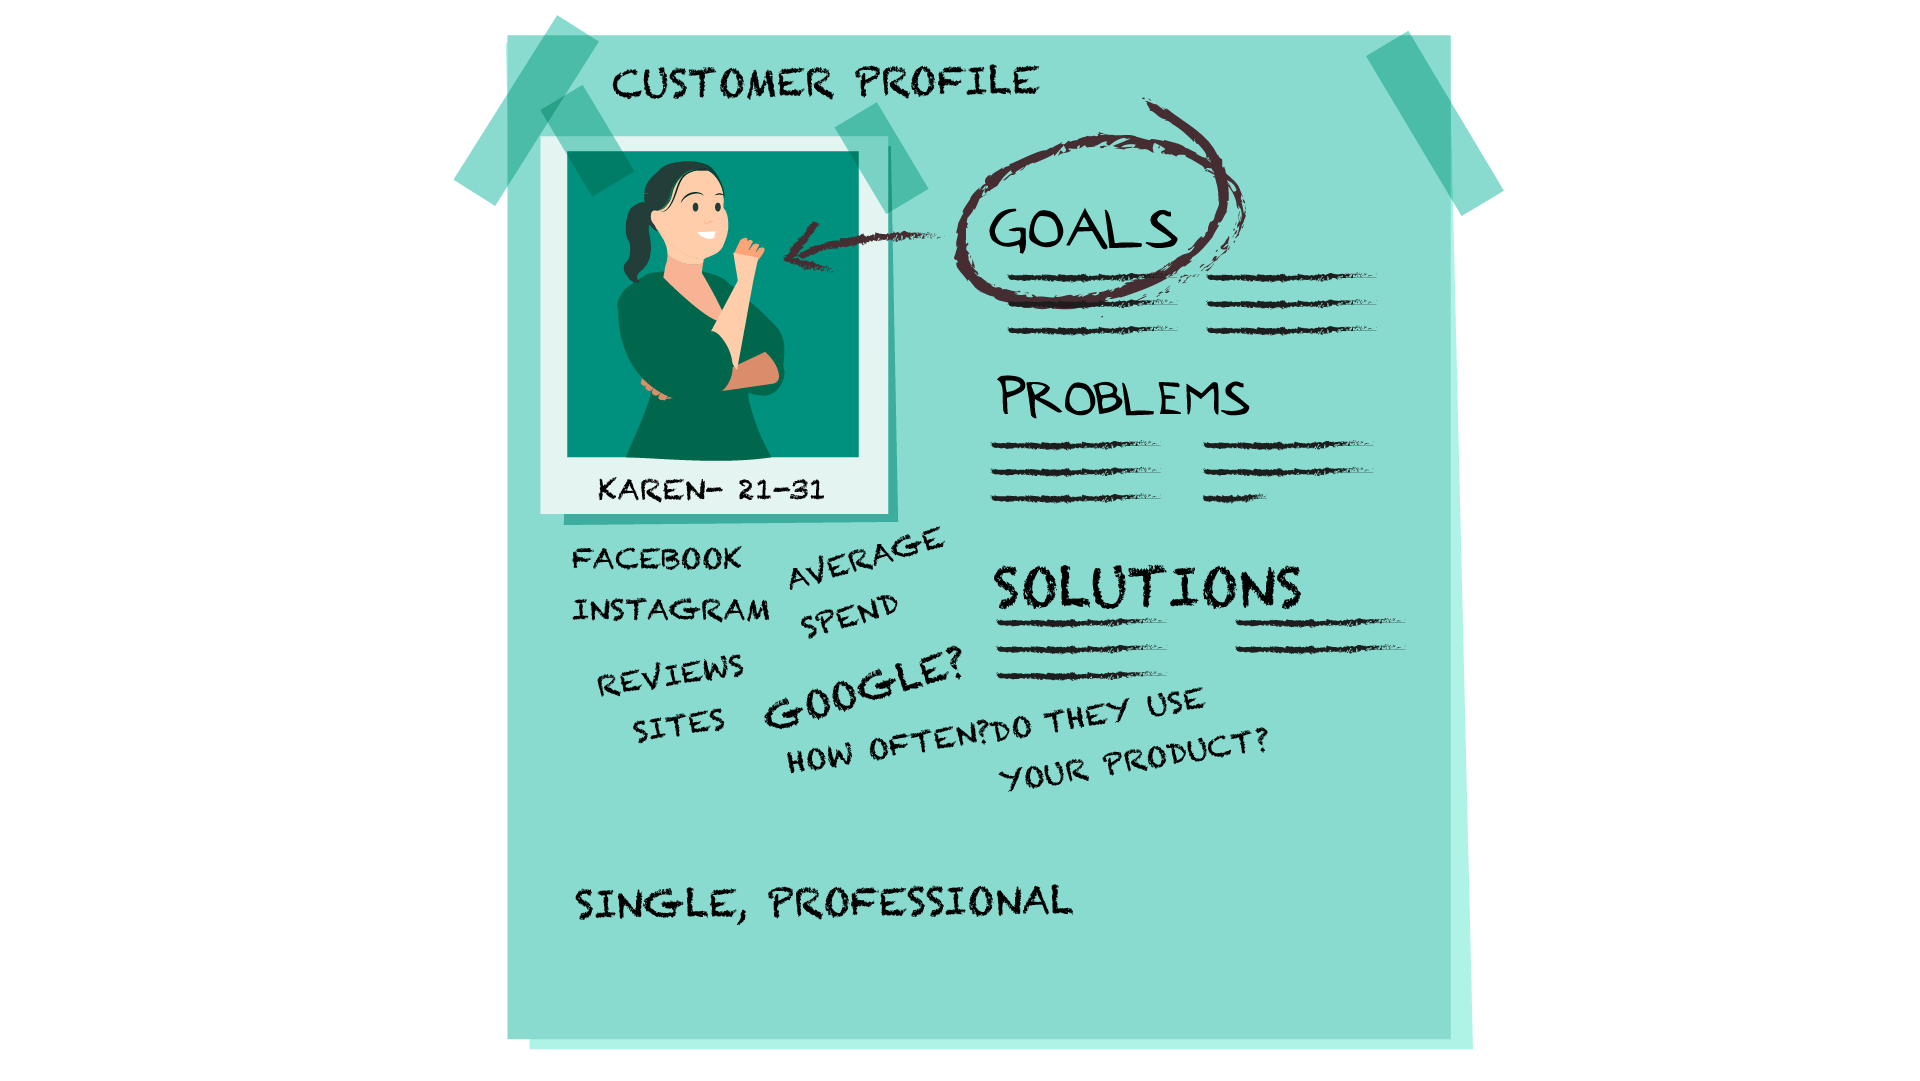 Create a customer profile